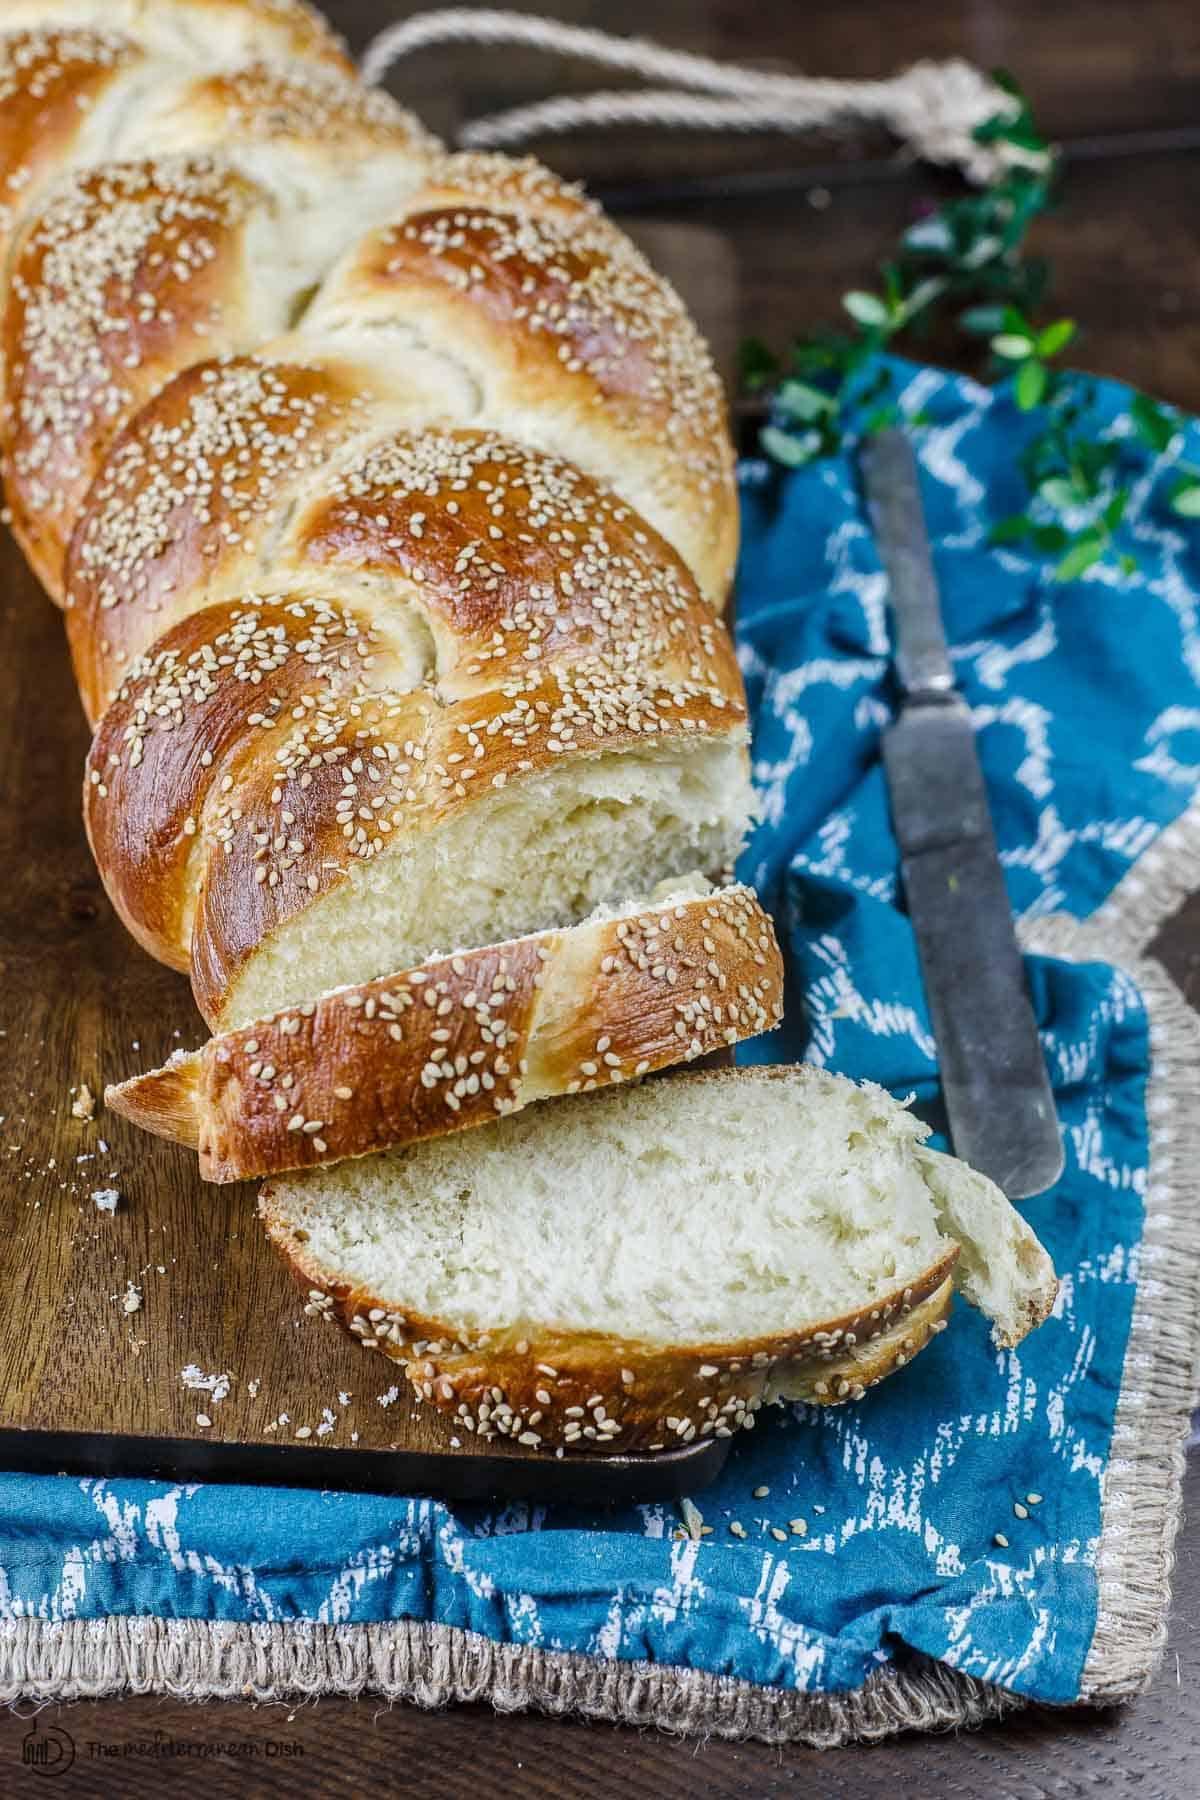 Challah bread sliced onto a board